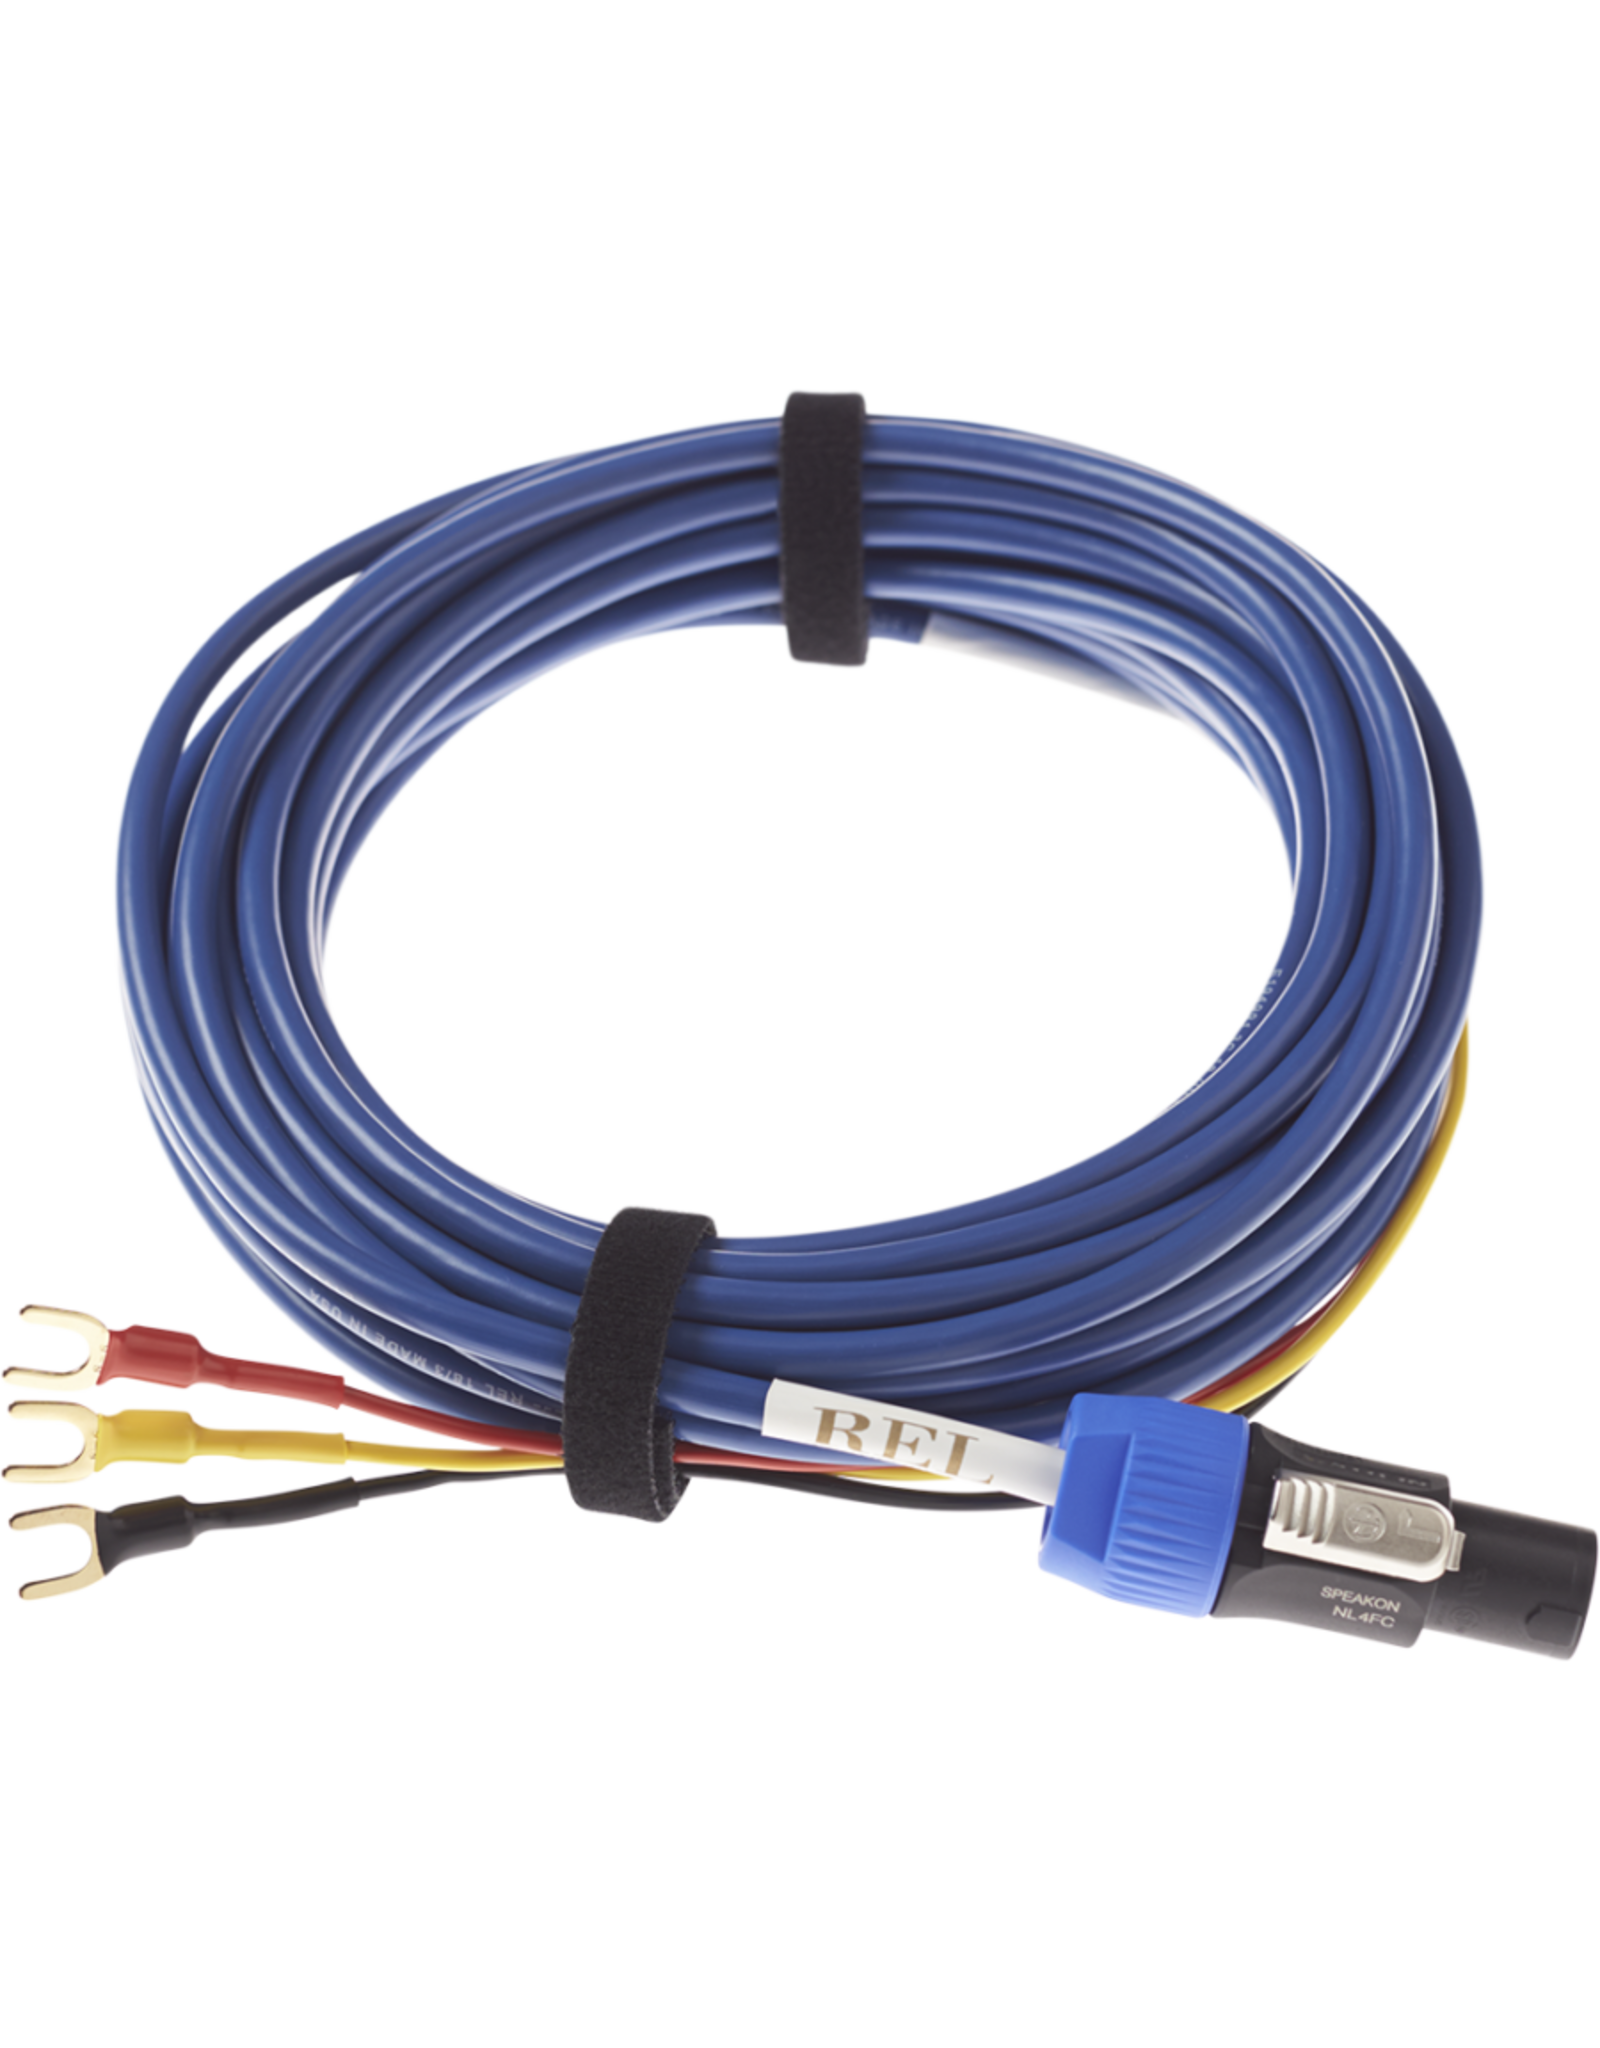 REL REL Bassline Blue Subwoofer Signal Cable